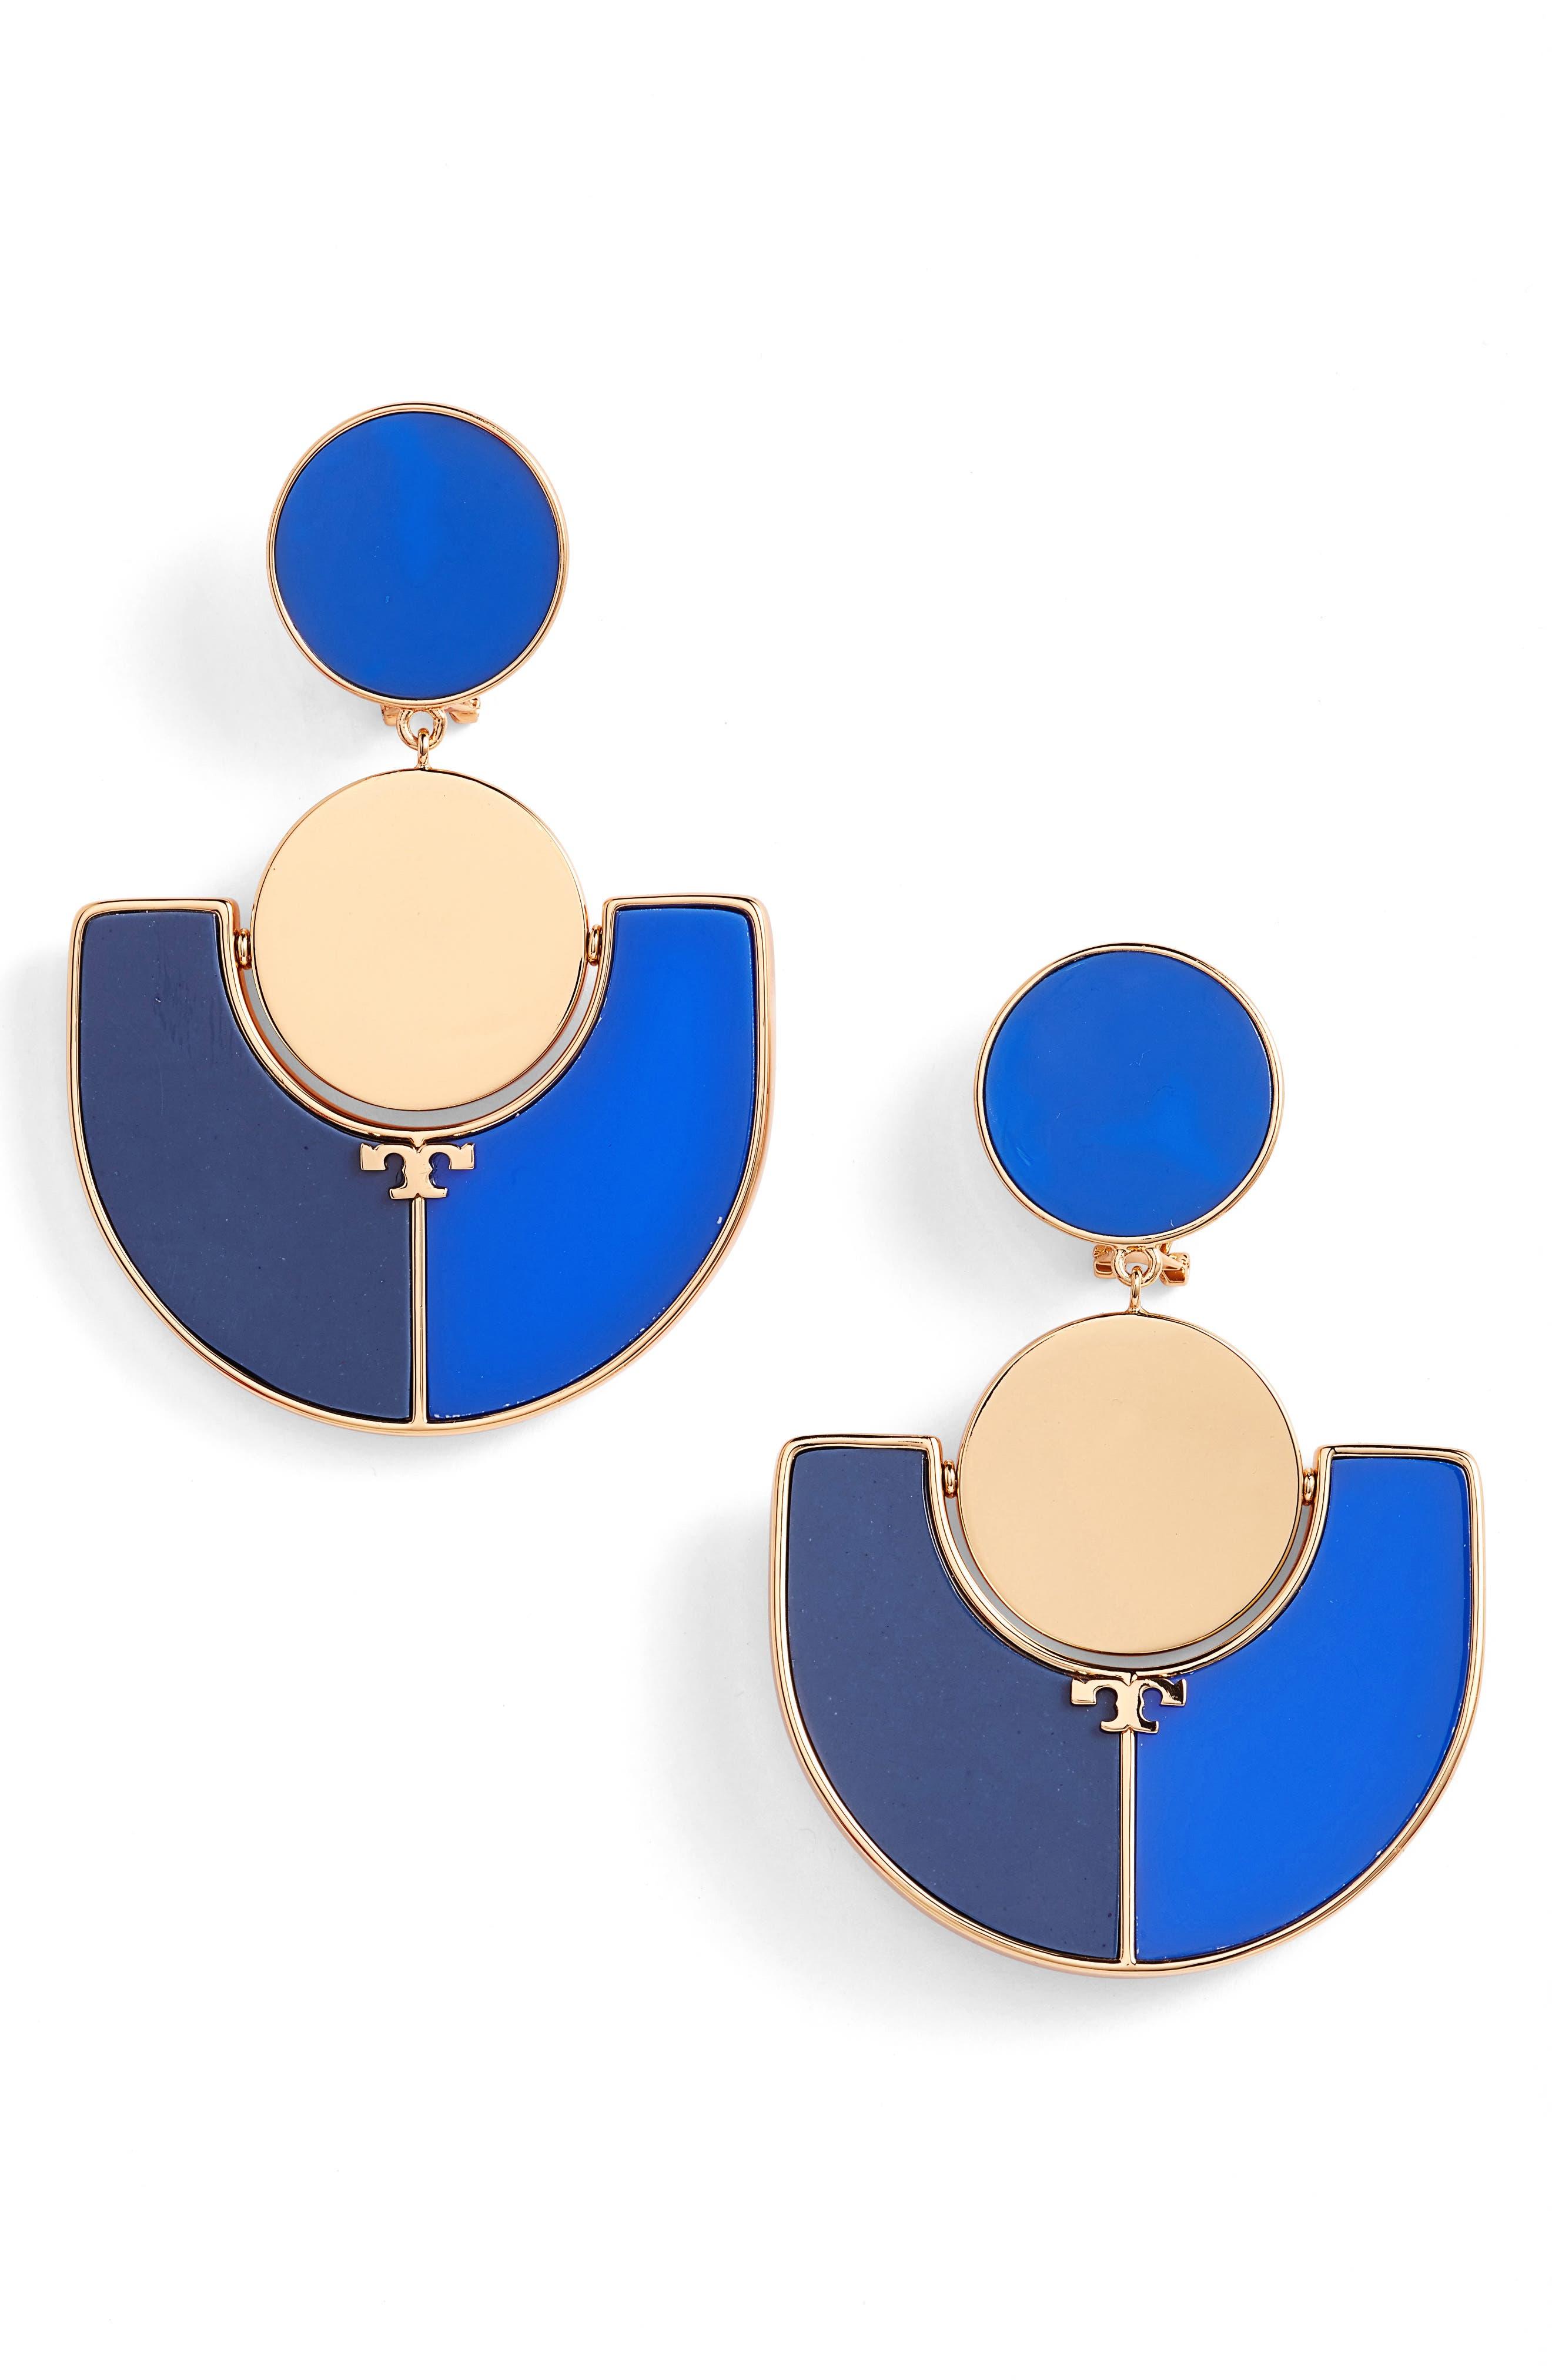 Tory Burch Large Drop Earrings